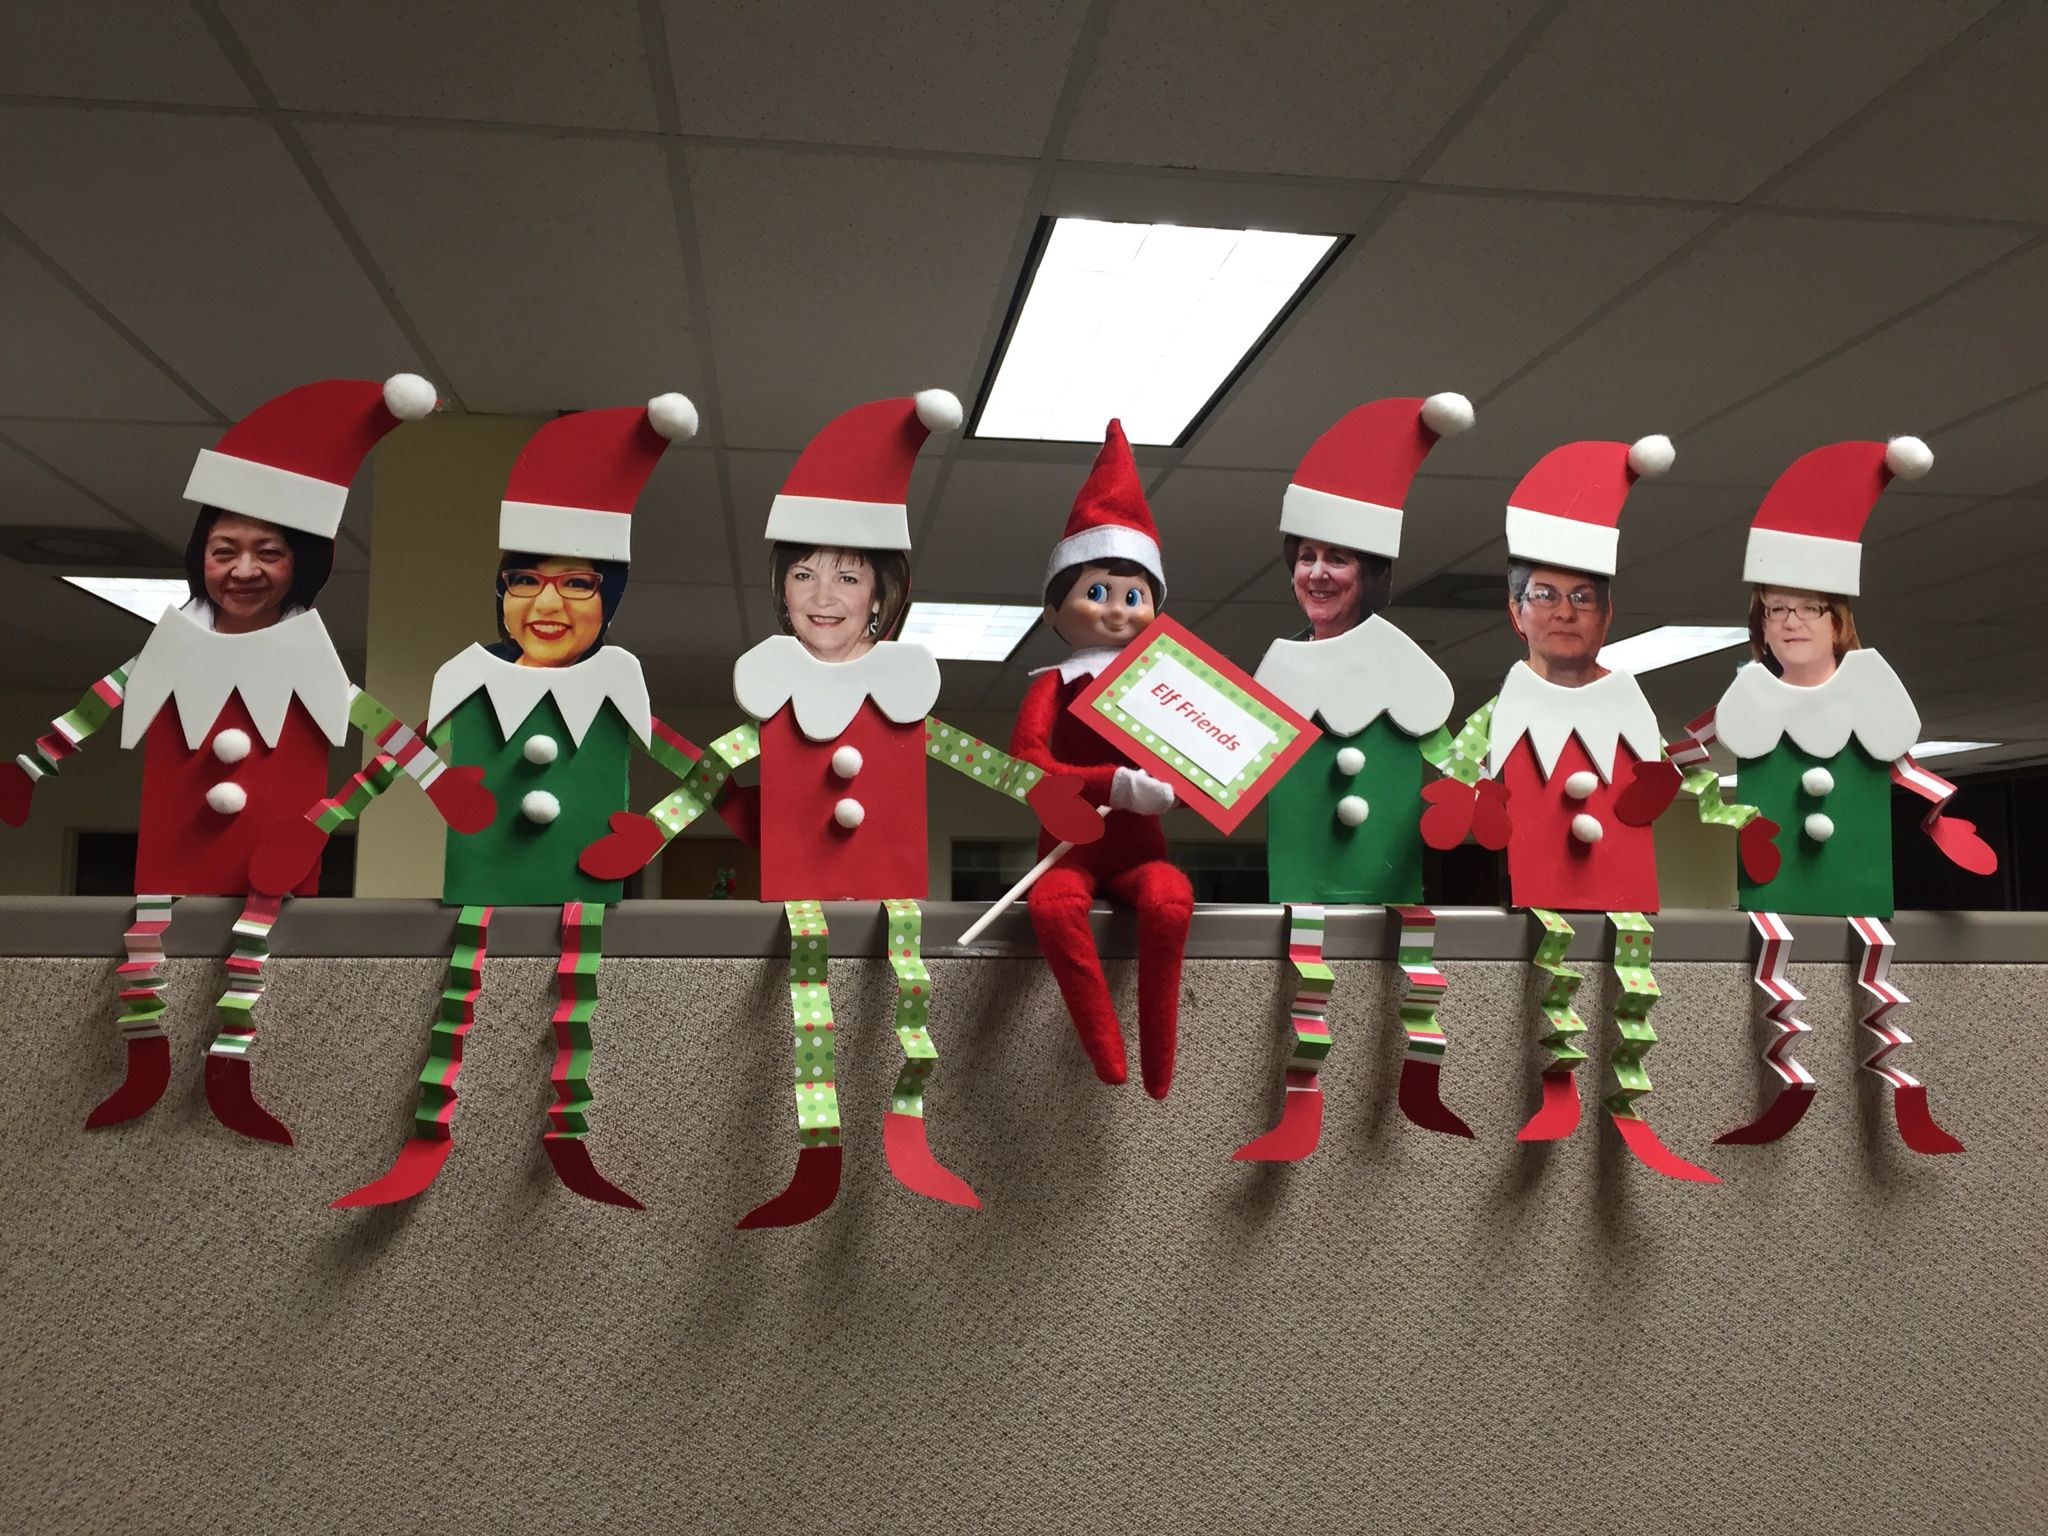 Merveilleux Christmas Office Decorations 31